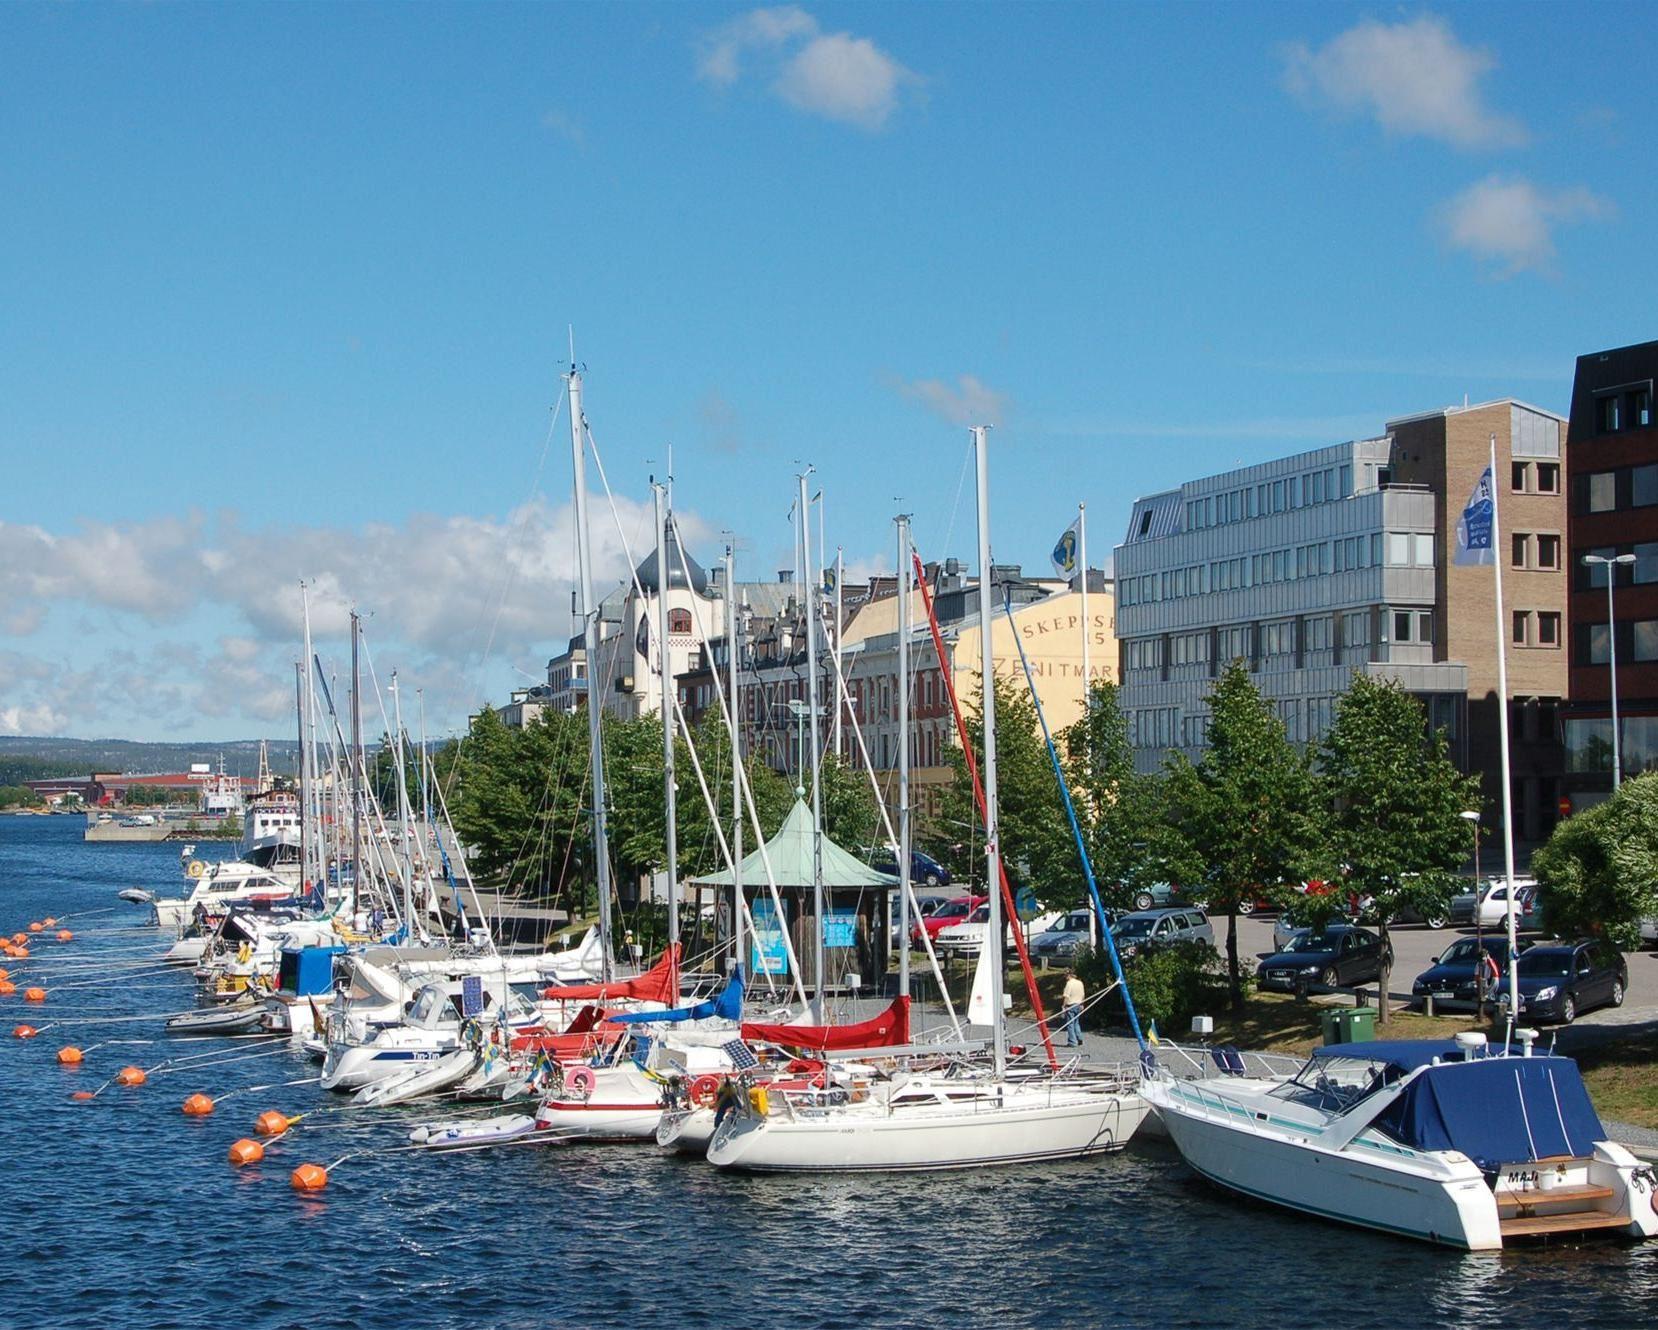 Norra hamnen Skeppsbron